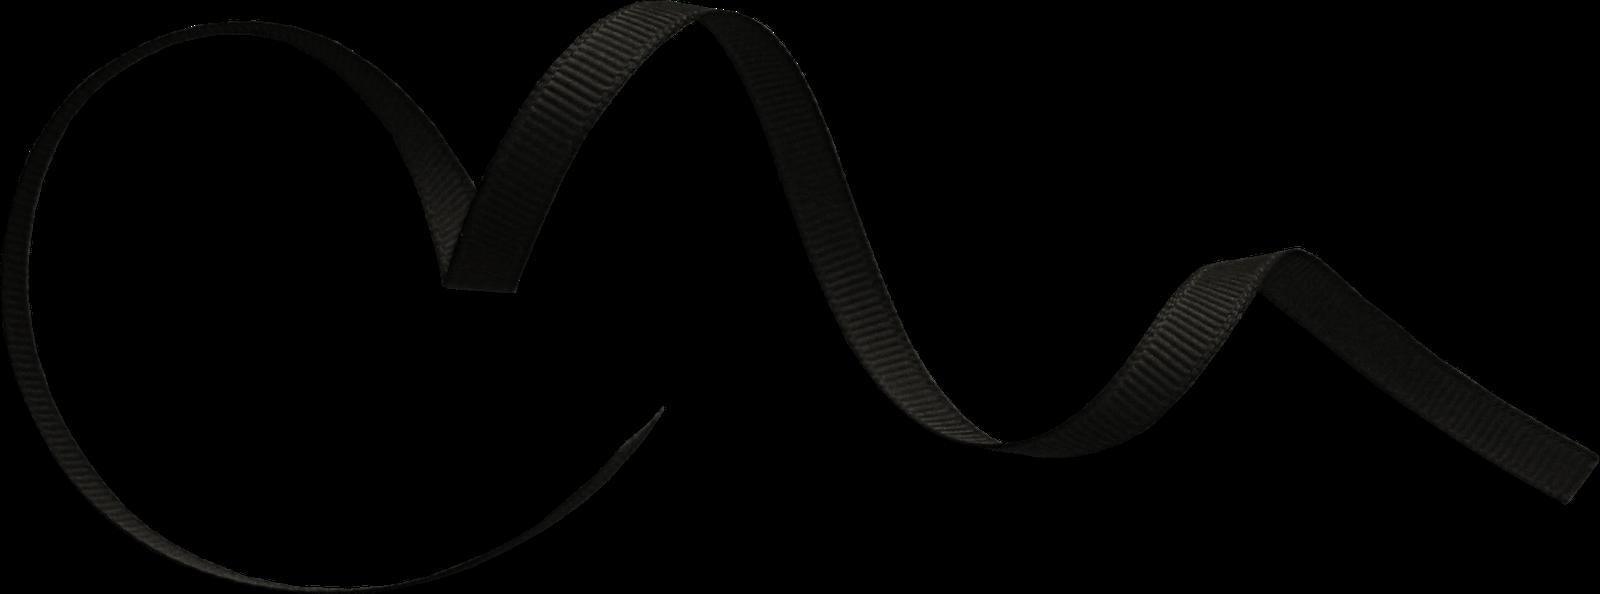 Free Curl Line Cliparts, Download Free Clip Art, Free Clip.